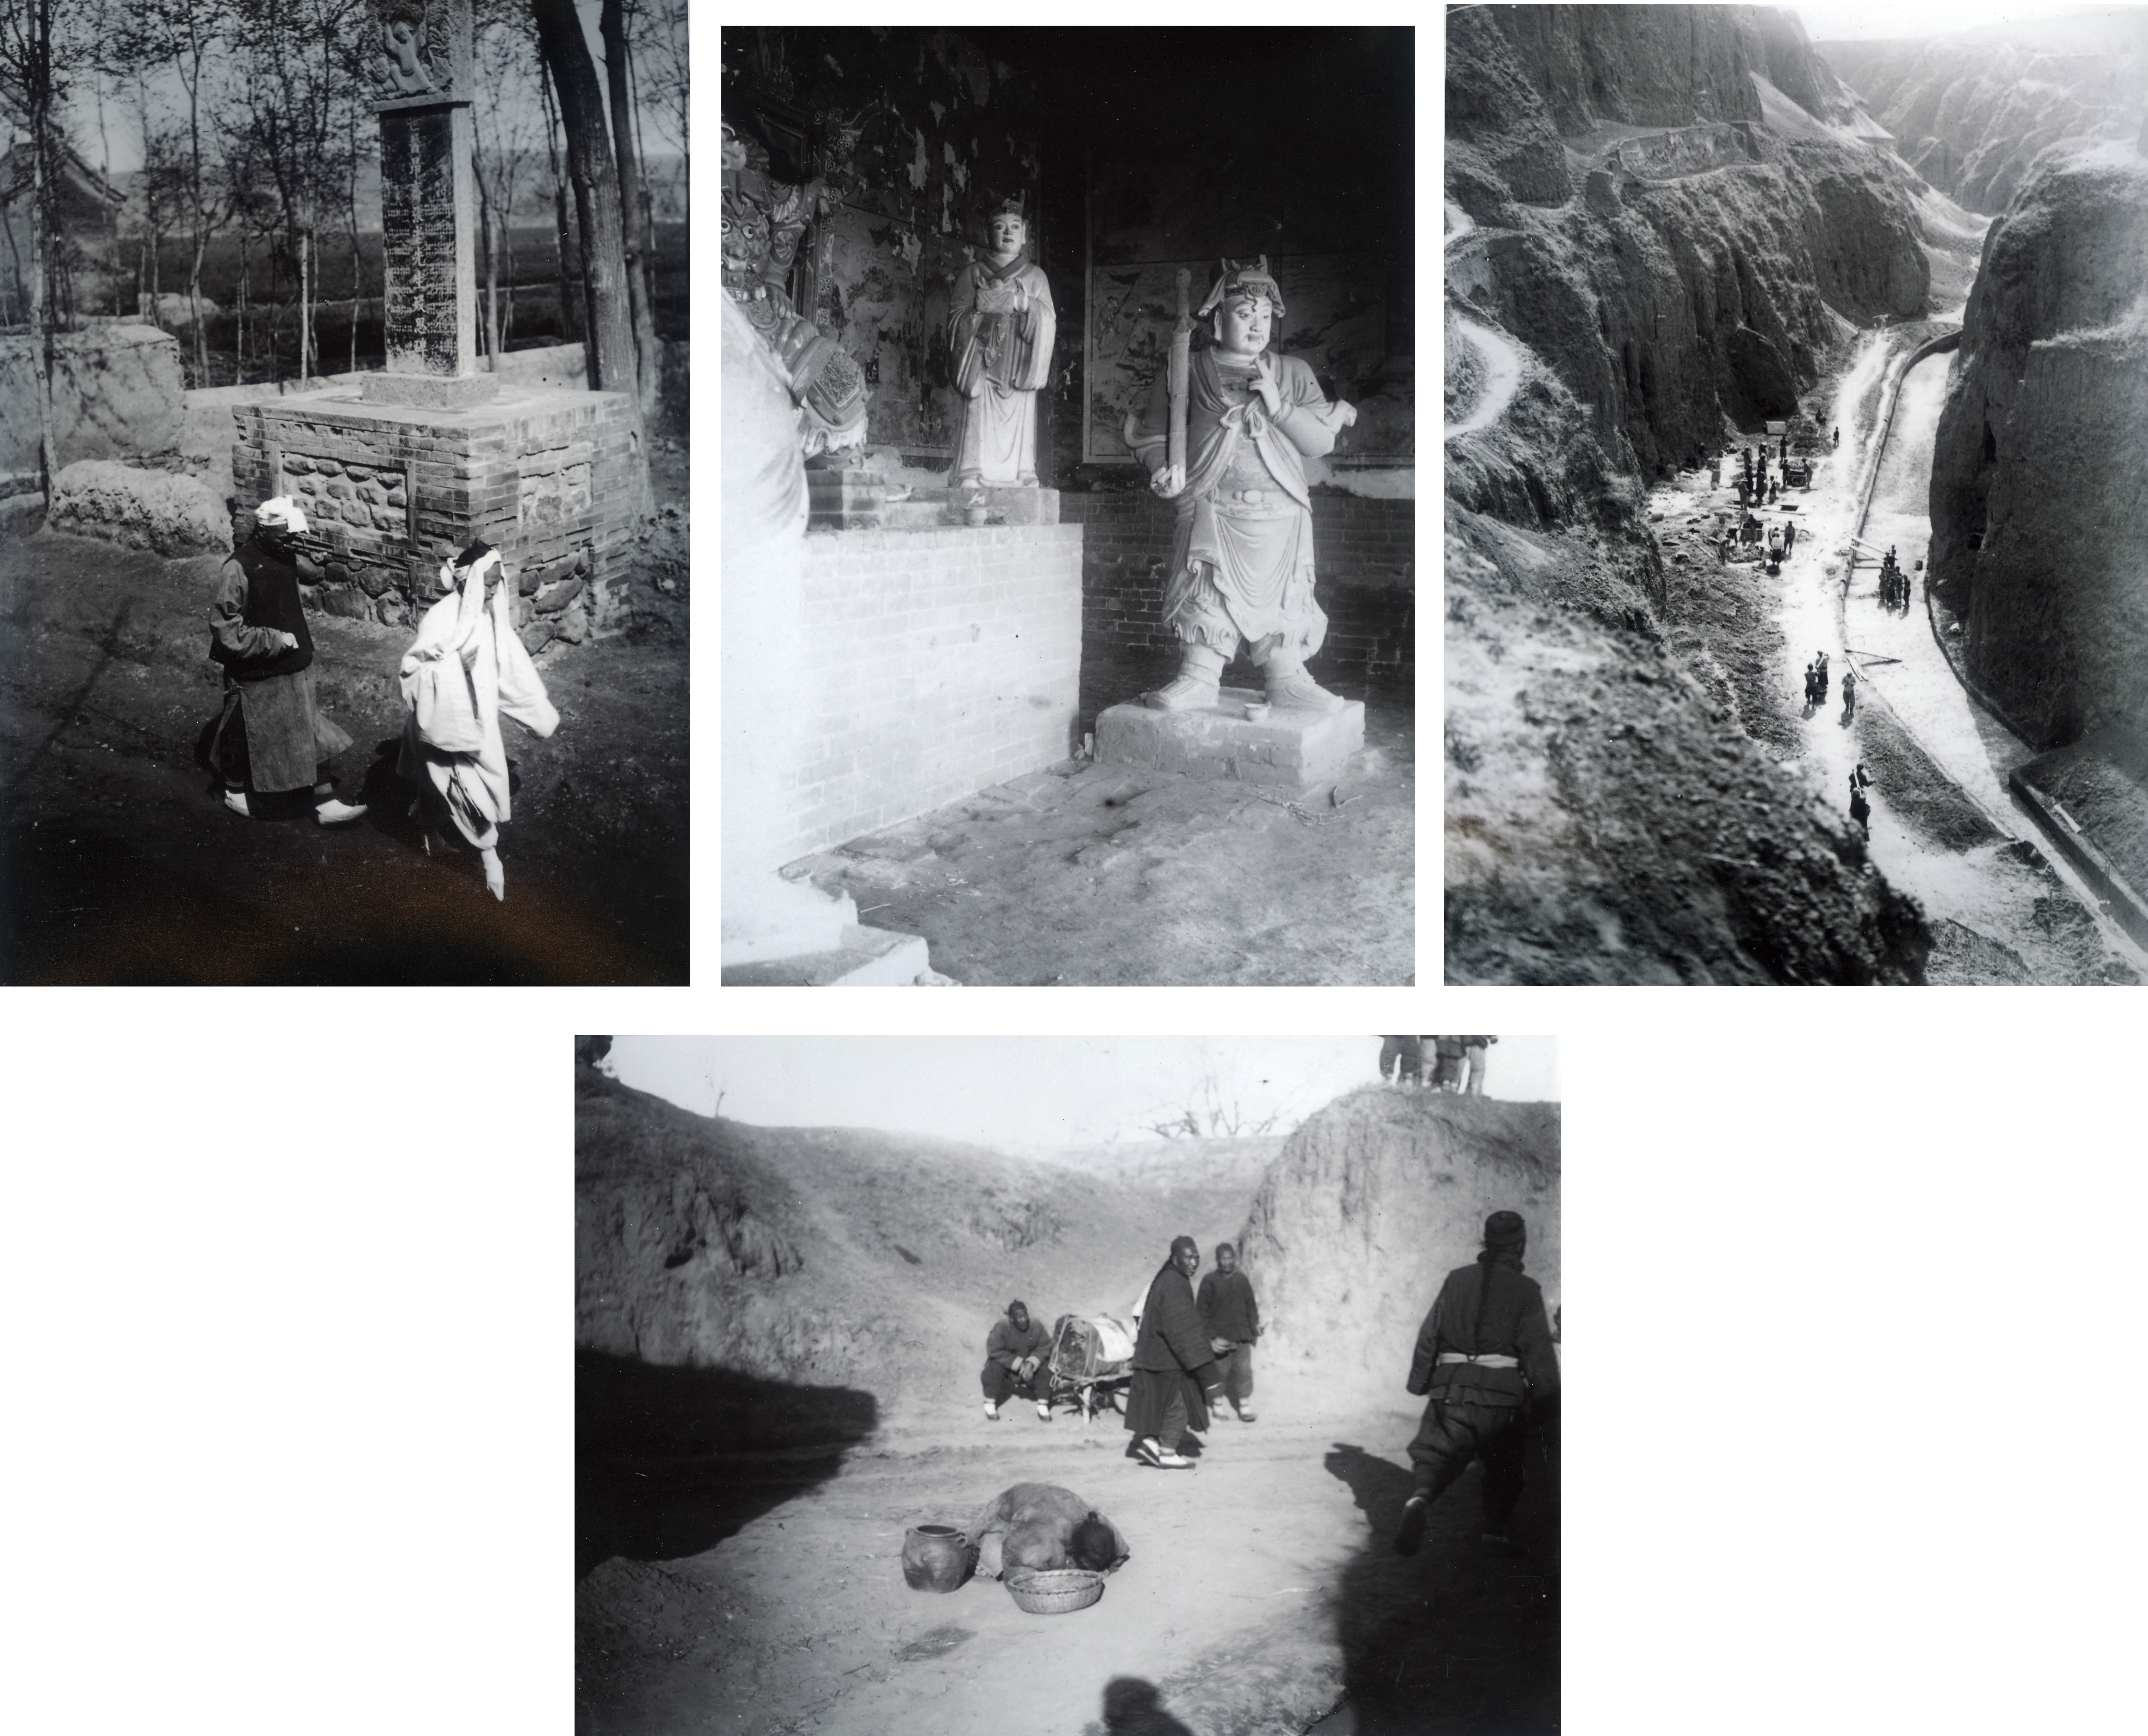 4 fotografie z Chin z prowincji Henan z lat 1906-1909